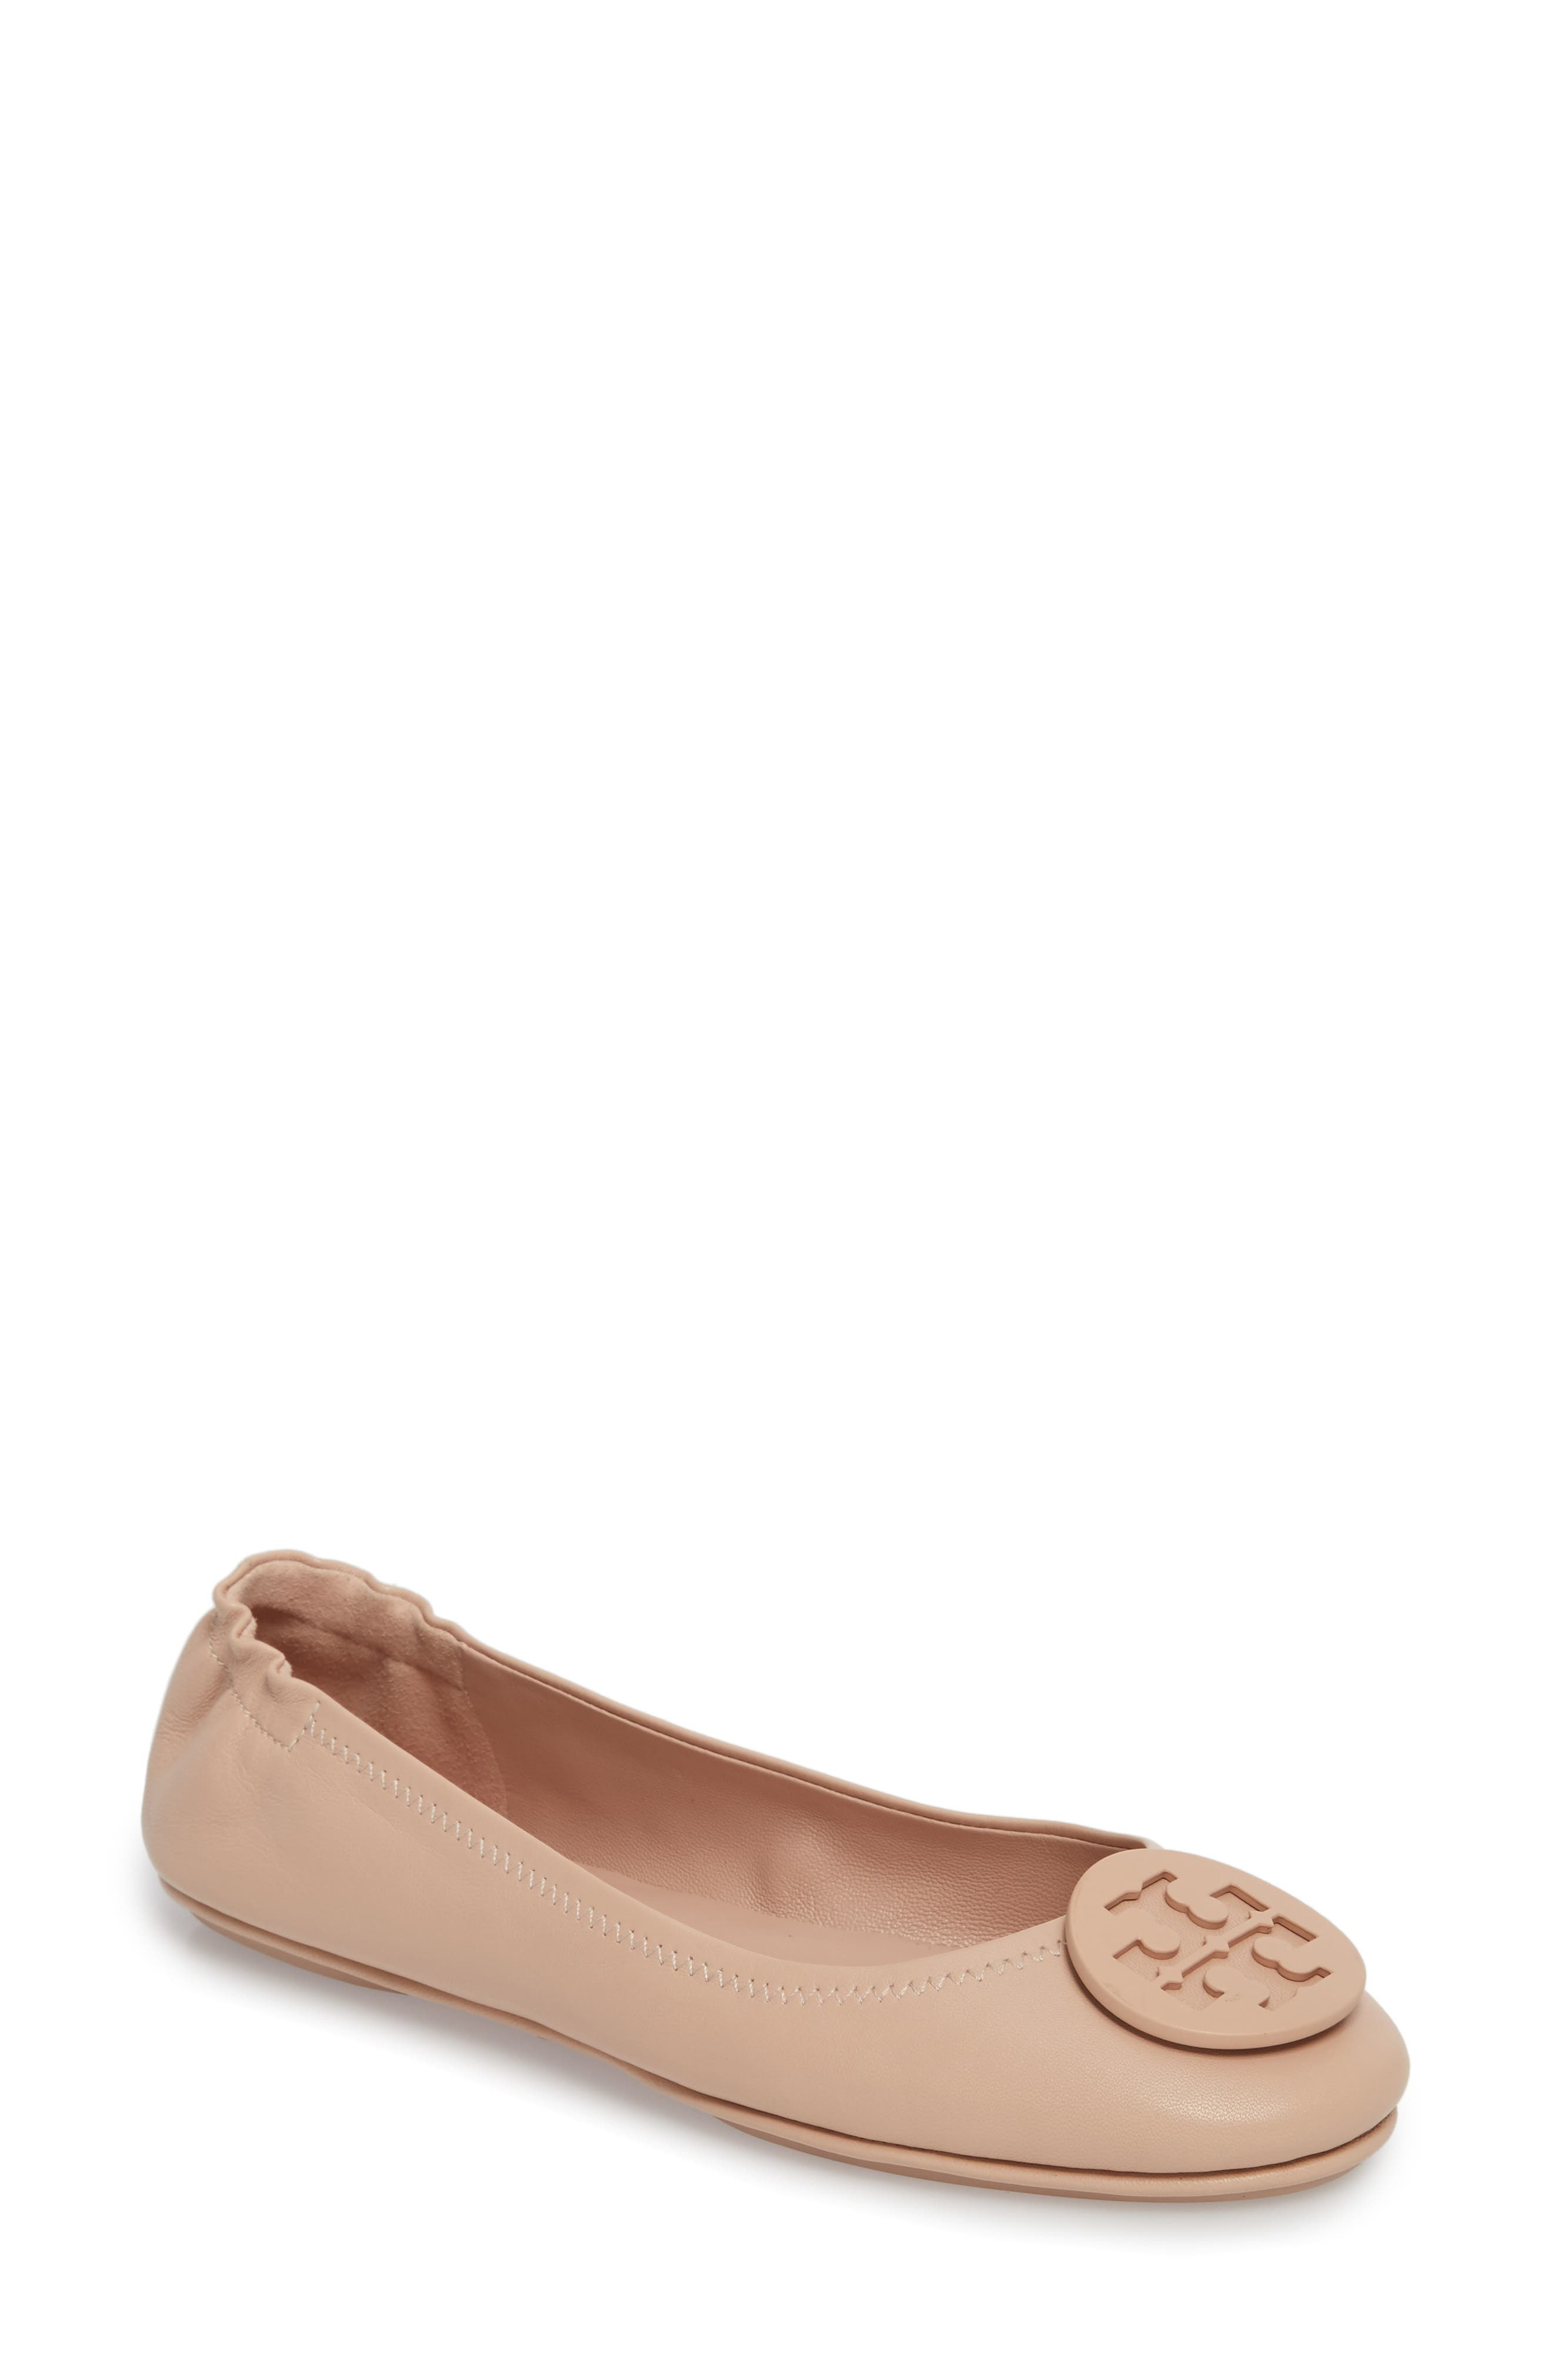 Alternate Image 1 Selected - Tory Burch 'Minnie' Travel Ballet Flat (Women)